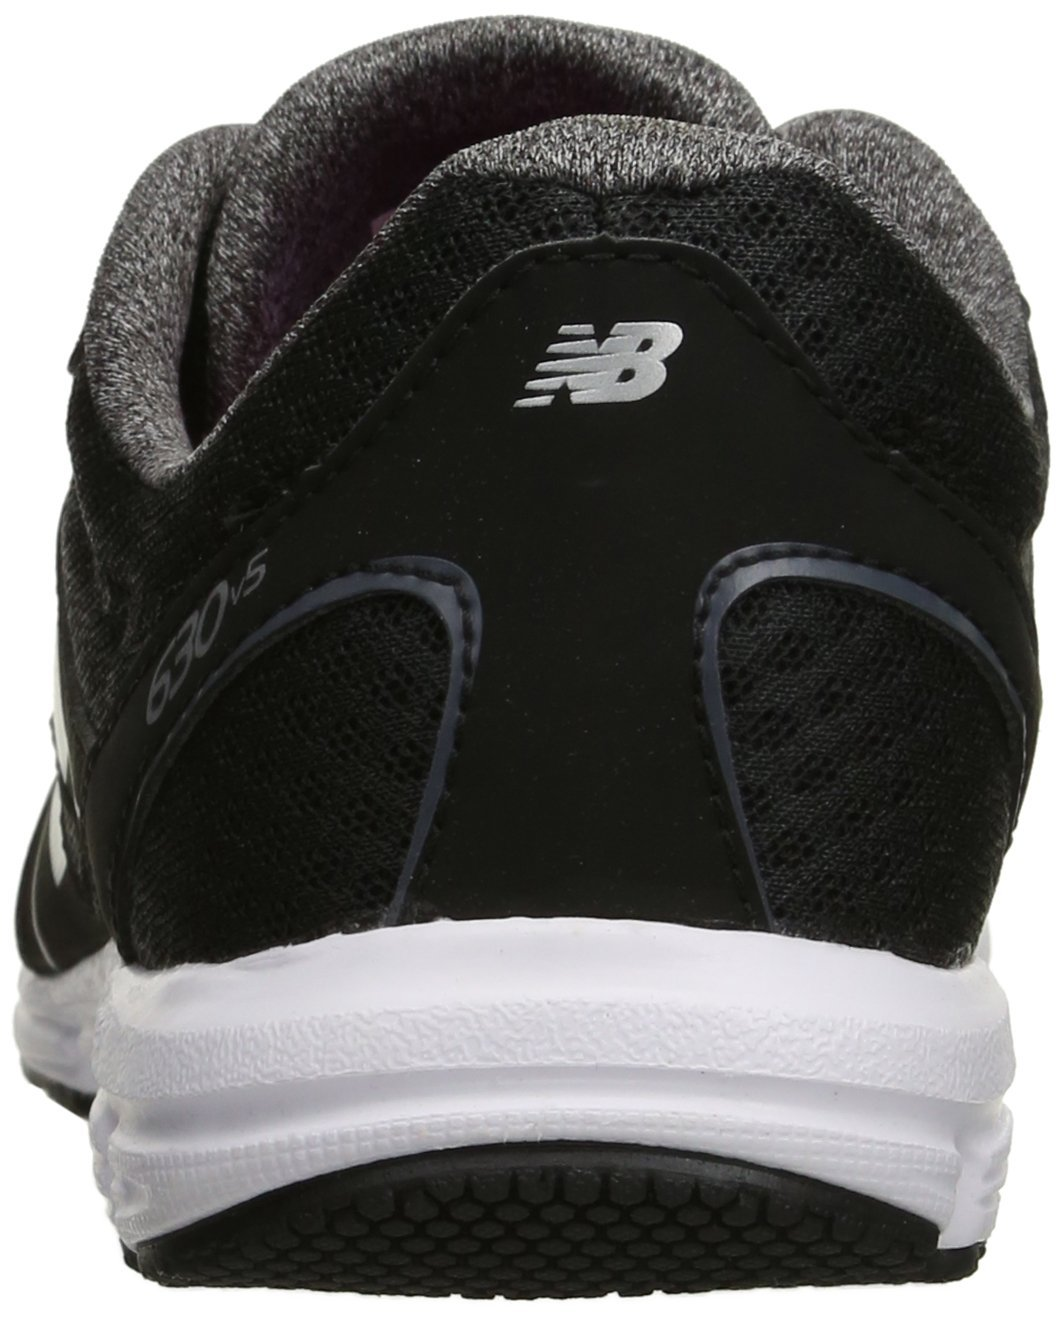 New Balance Women's 630v5 Flex Ride Running Shoe B0163GIYRA 6 D US|Black/Grey